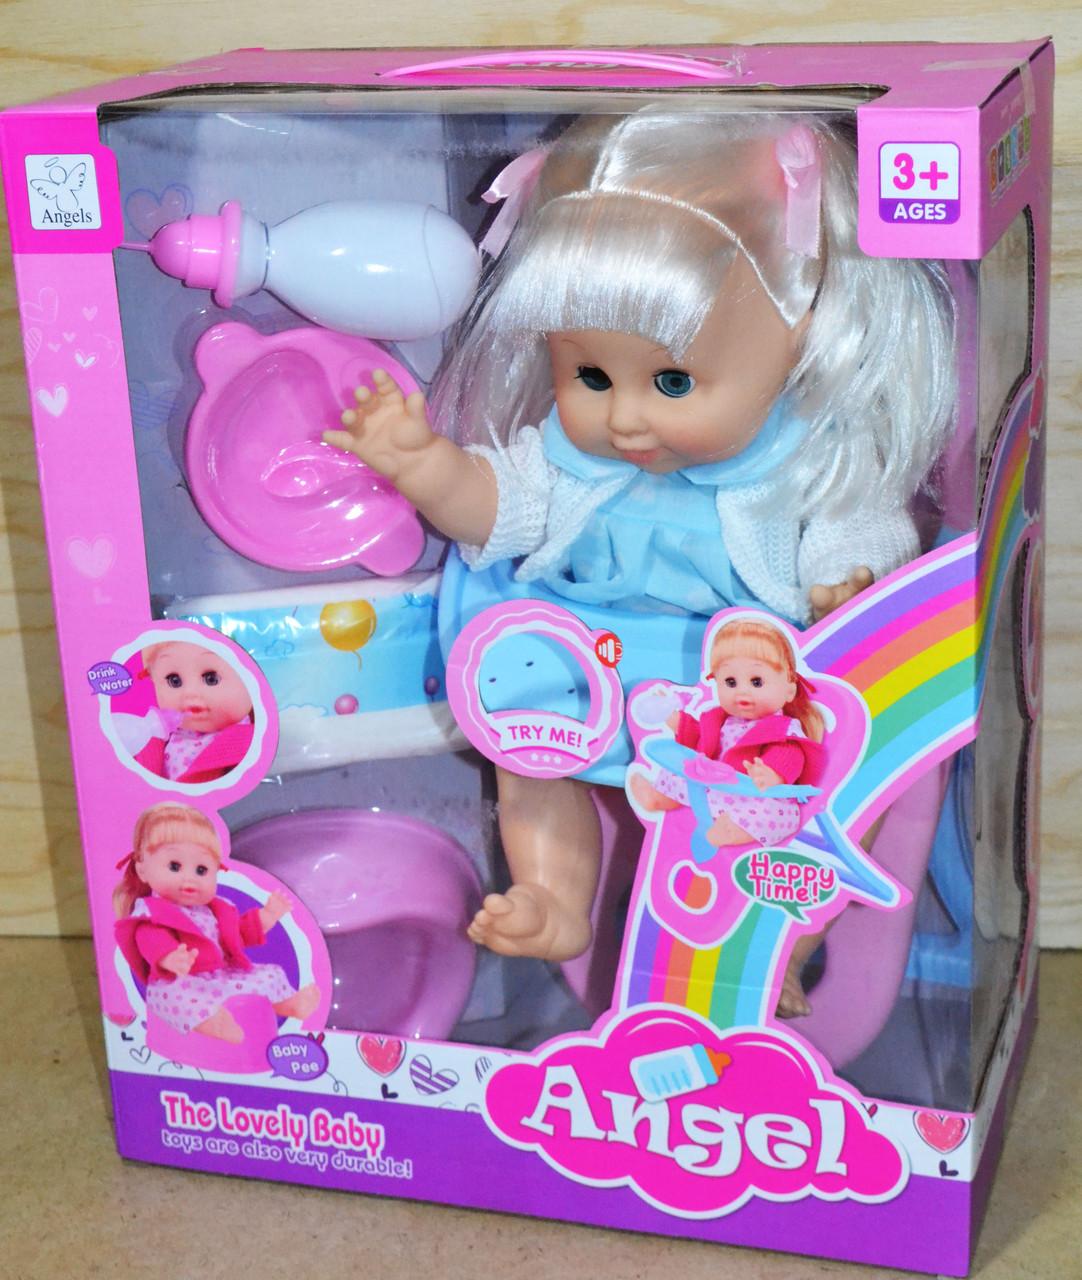 7207 Кукла Angel с горшком памперсом и бутылочкой 37*30